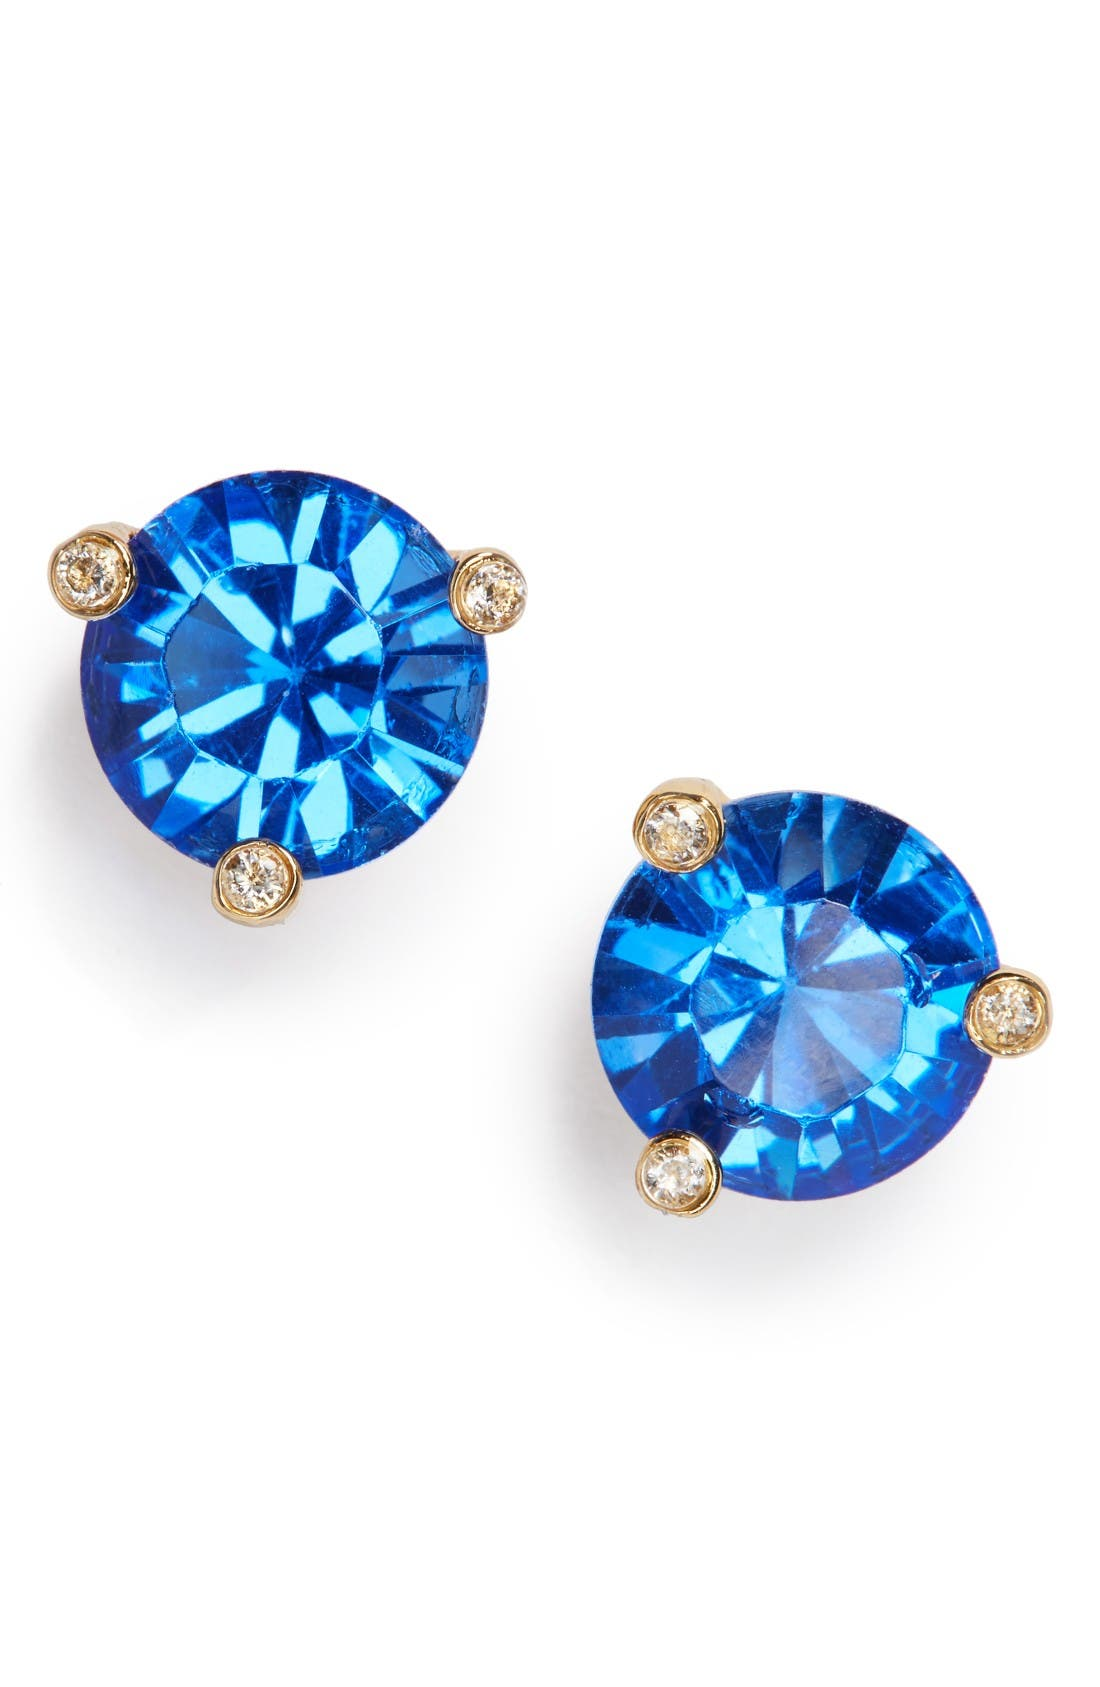 Alternate Image 1 Selected - kate spade new york 'rise & shine' stud earrings